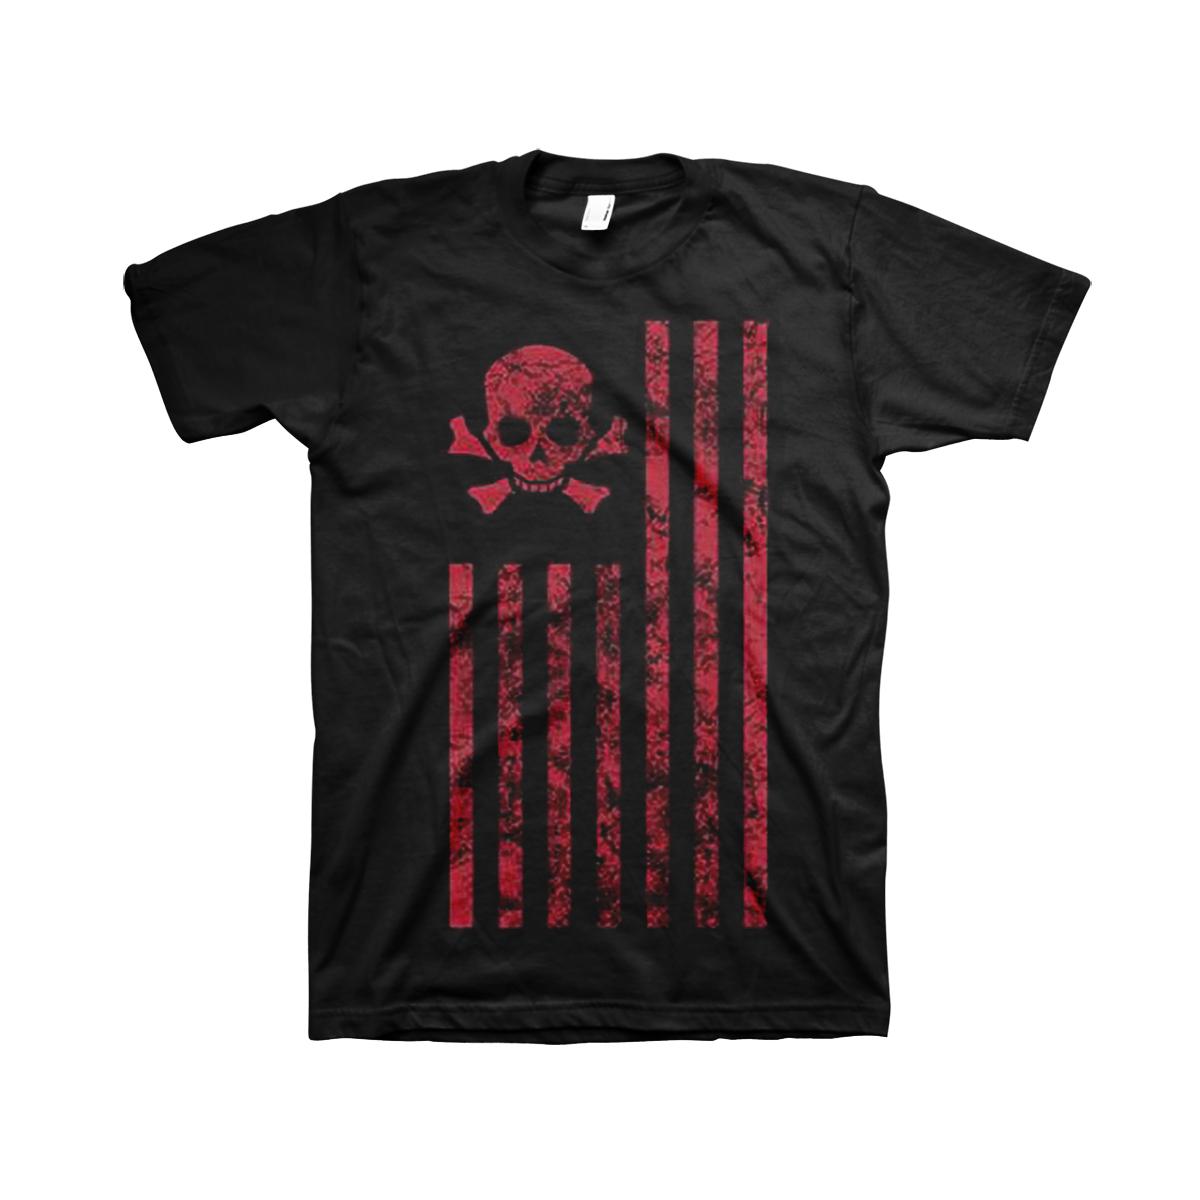 Skulls & Stripes T-shirt